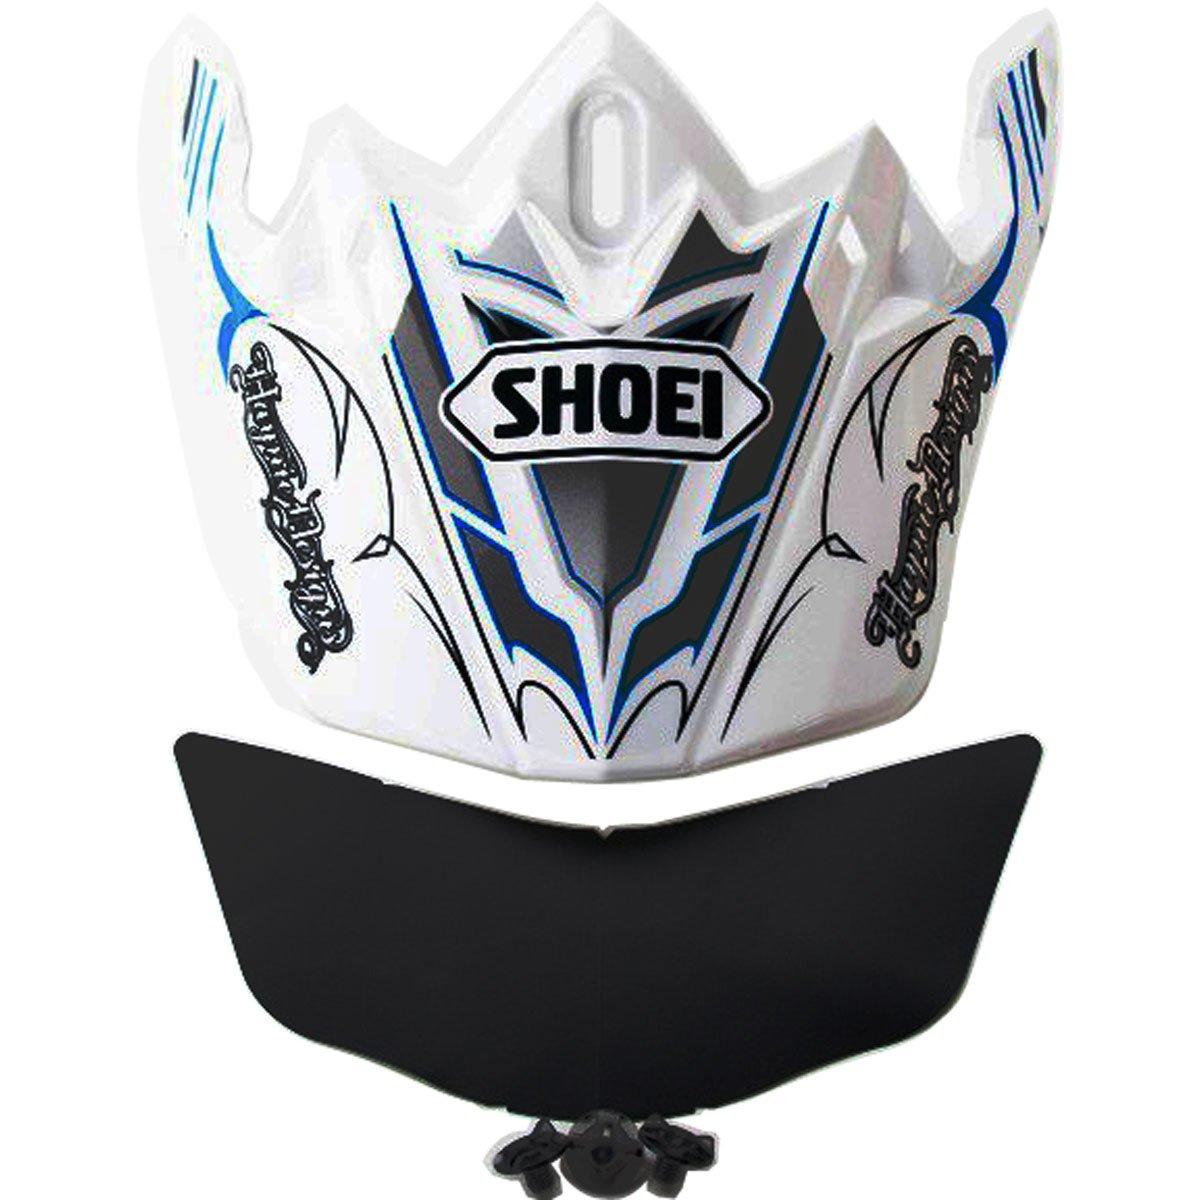 Shoei VFX-W Sleek Visor K-Dub2 Off-Road Motorcycle Helmet Accessories - TC-6 / One Size